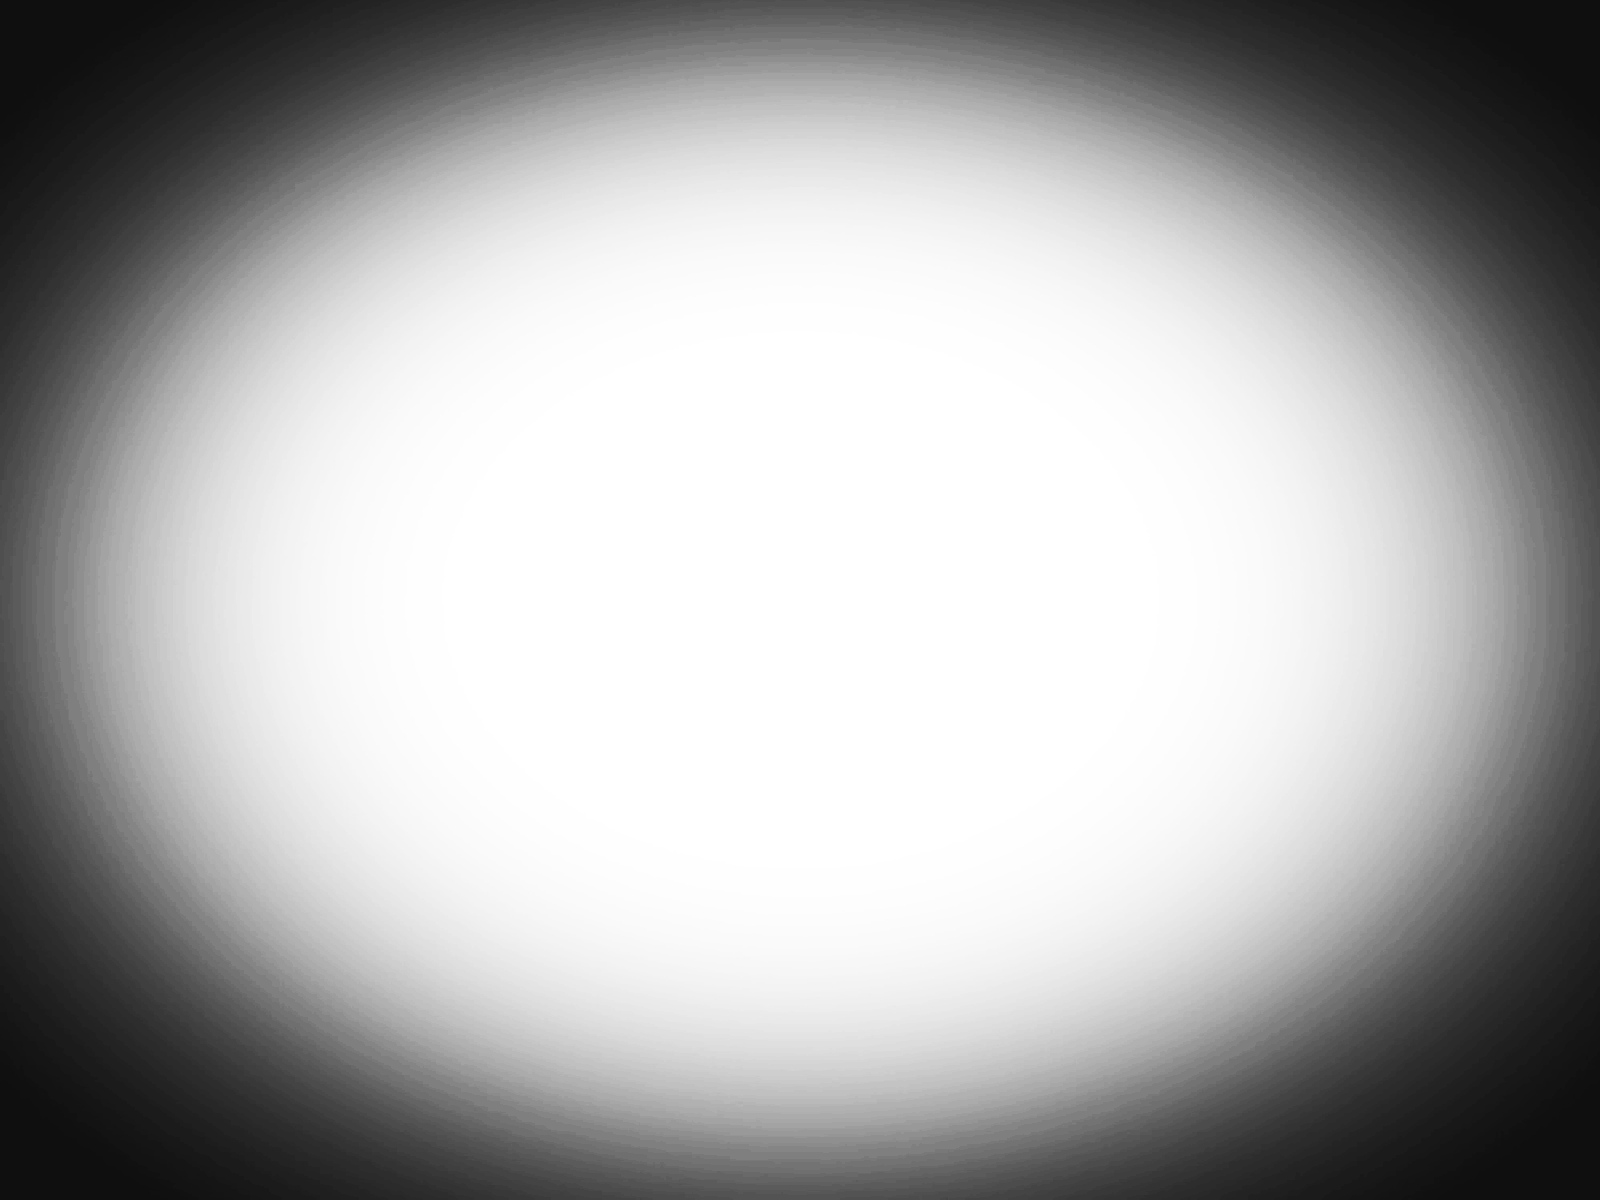 Click image for larger version.  Name:13 black oval vignette.png Views:33154 Size:179.1 KB ID:3680